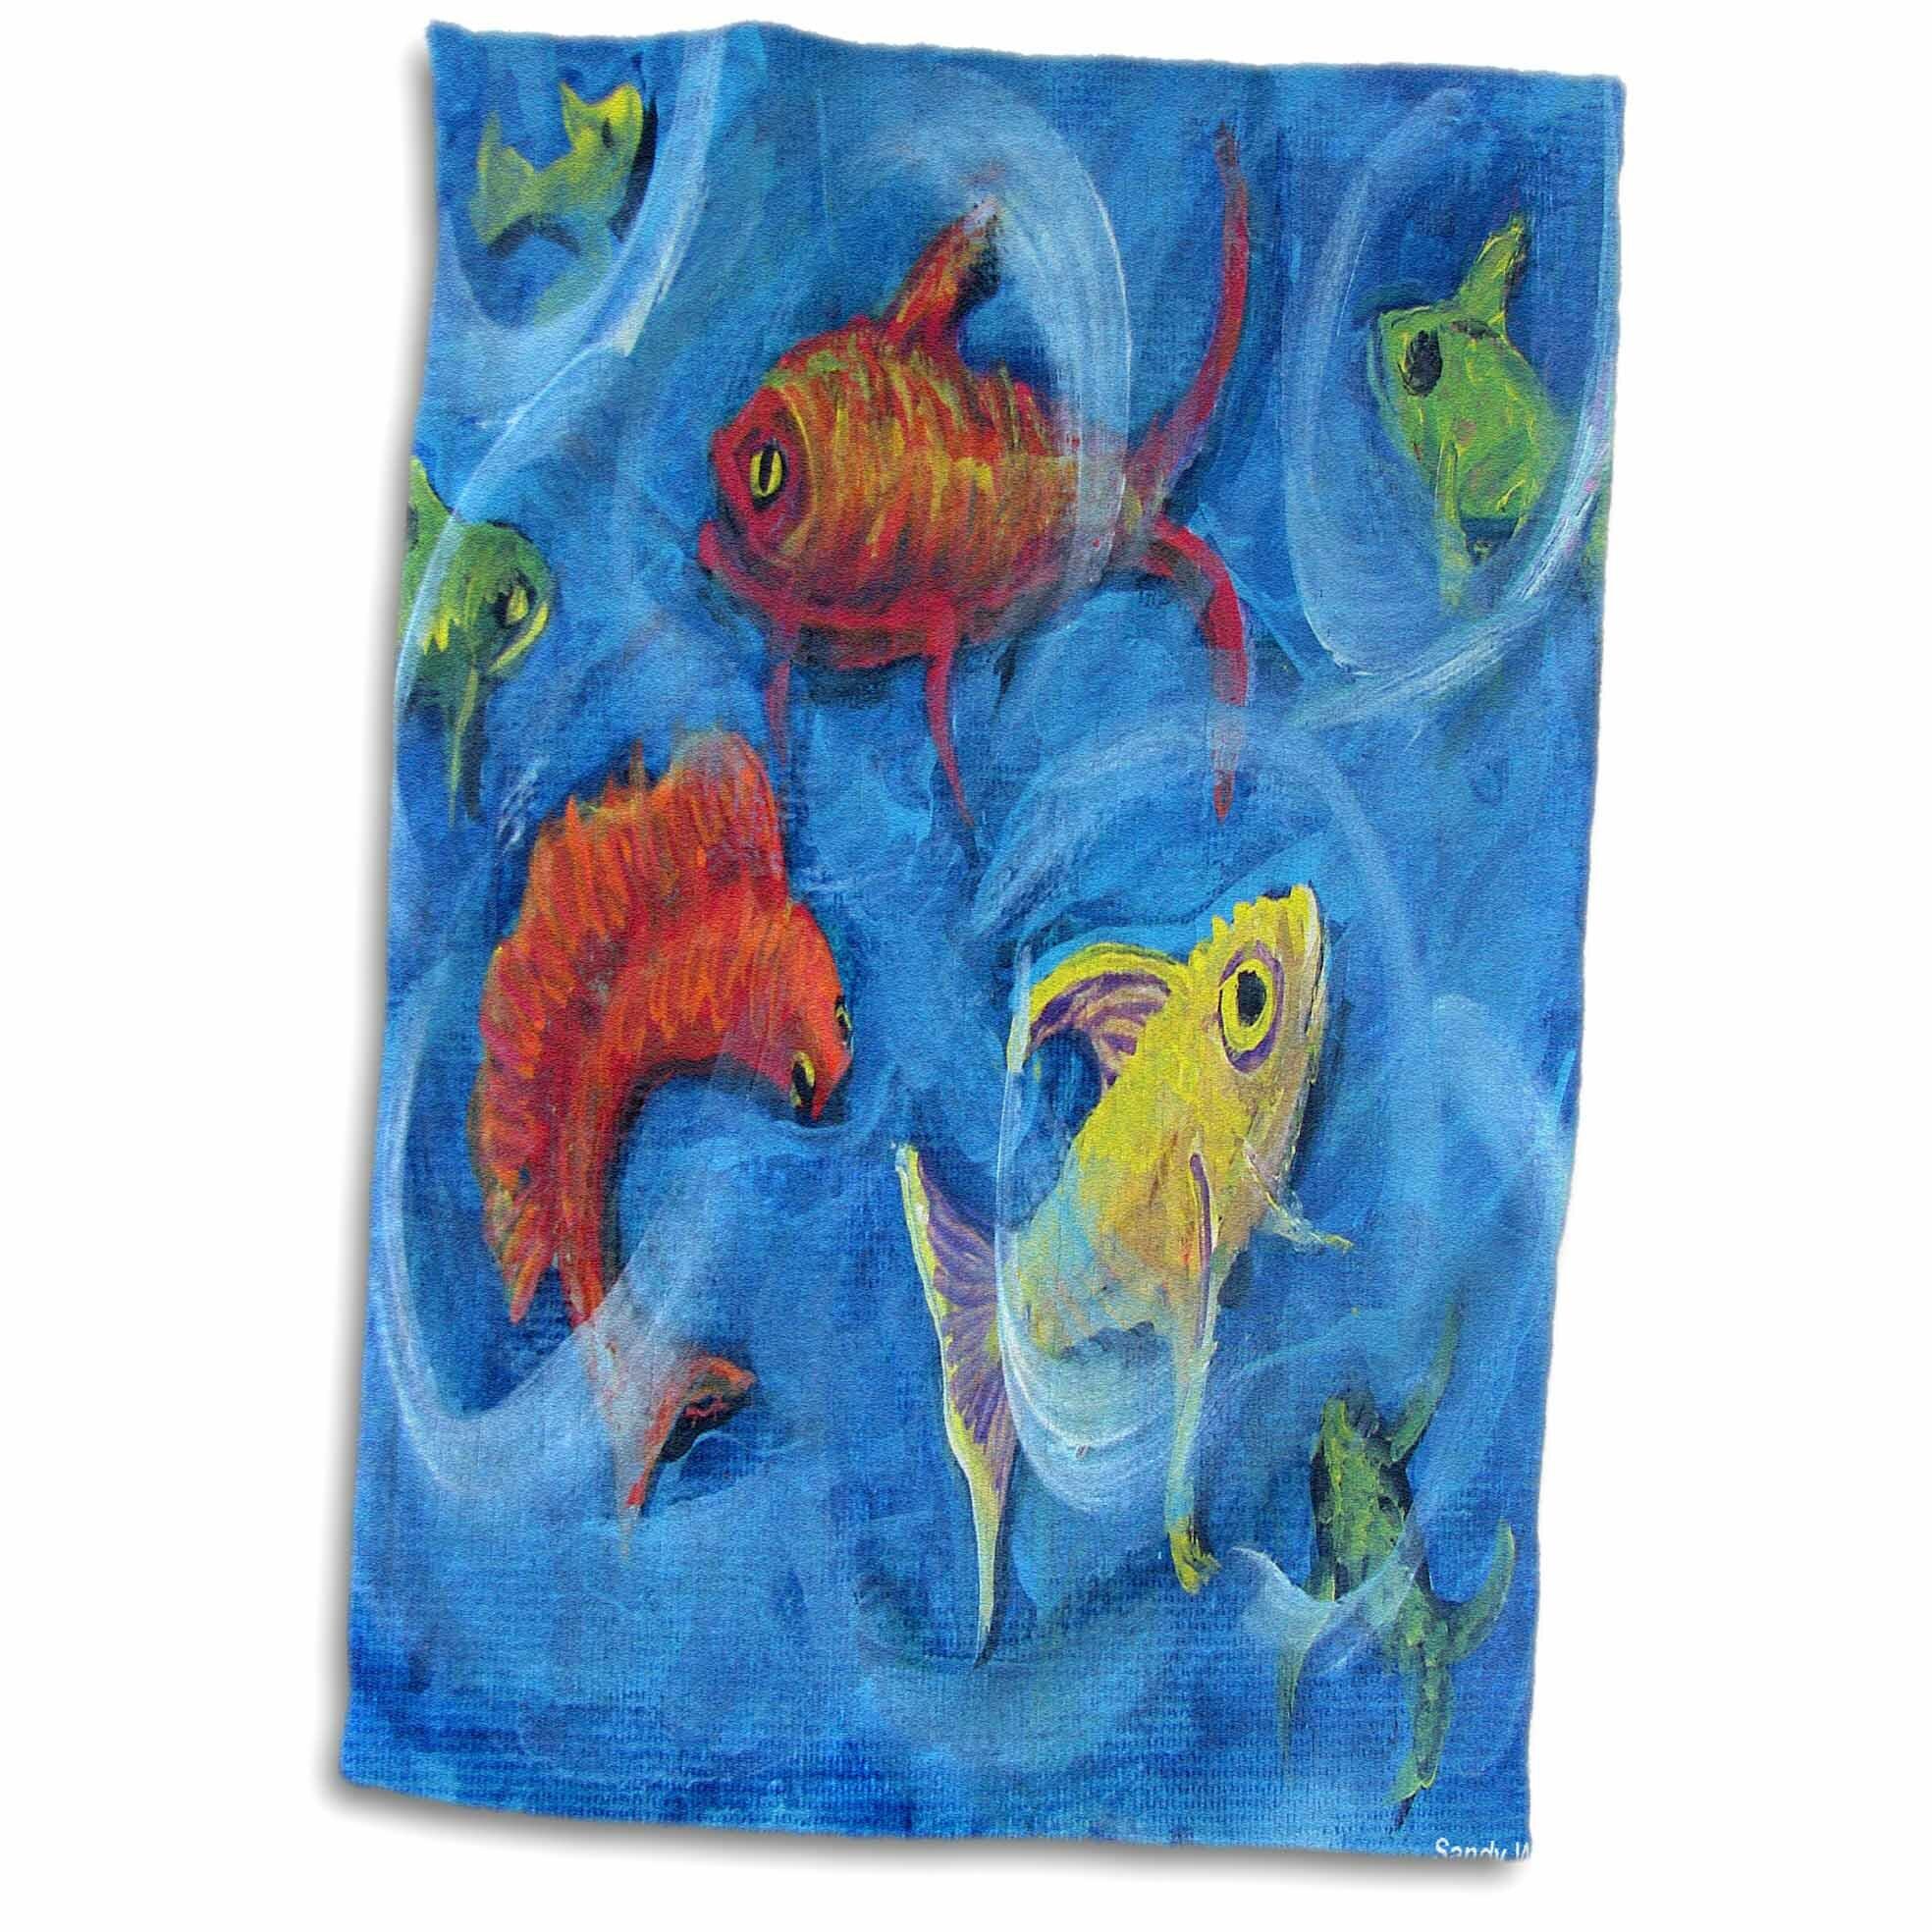 Symple Stuff Cristobal Dance Club Fish Swing And Swirl In Bright Hand Towel Wayfair